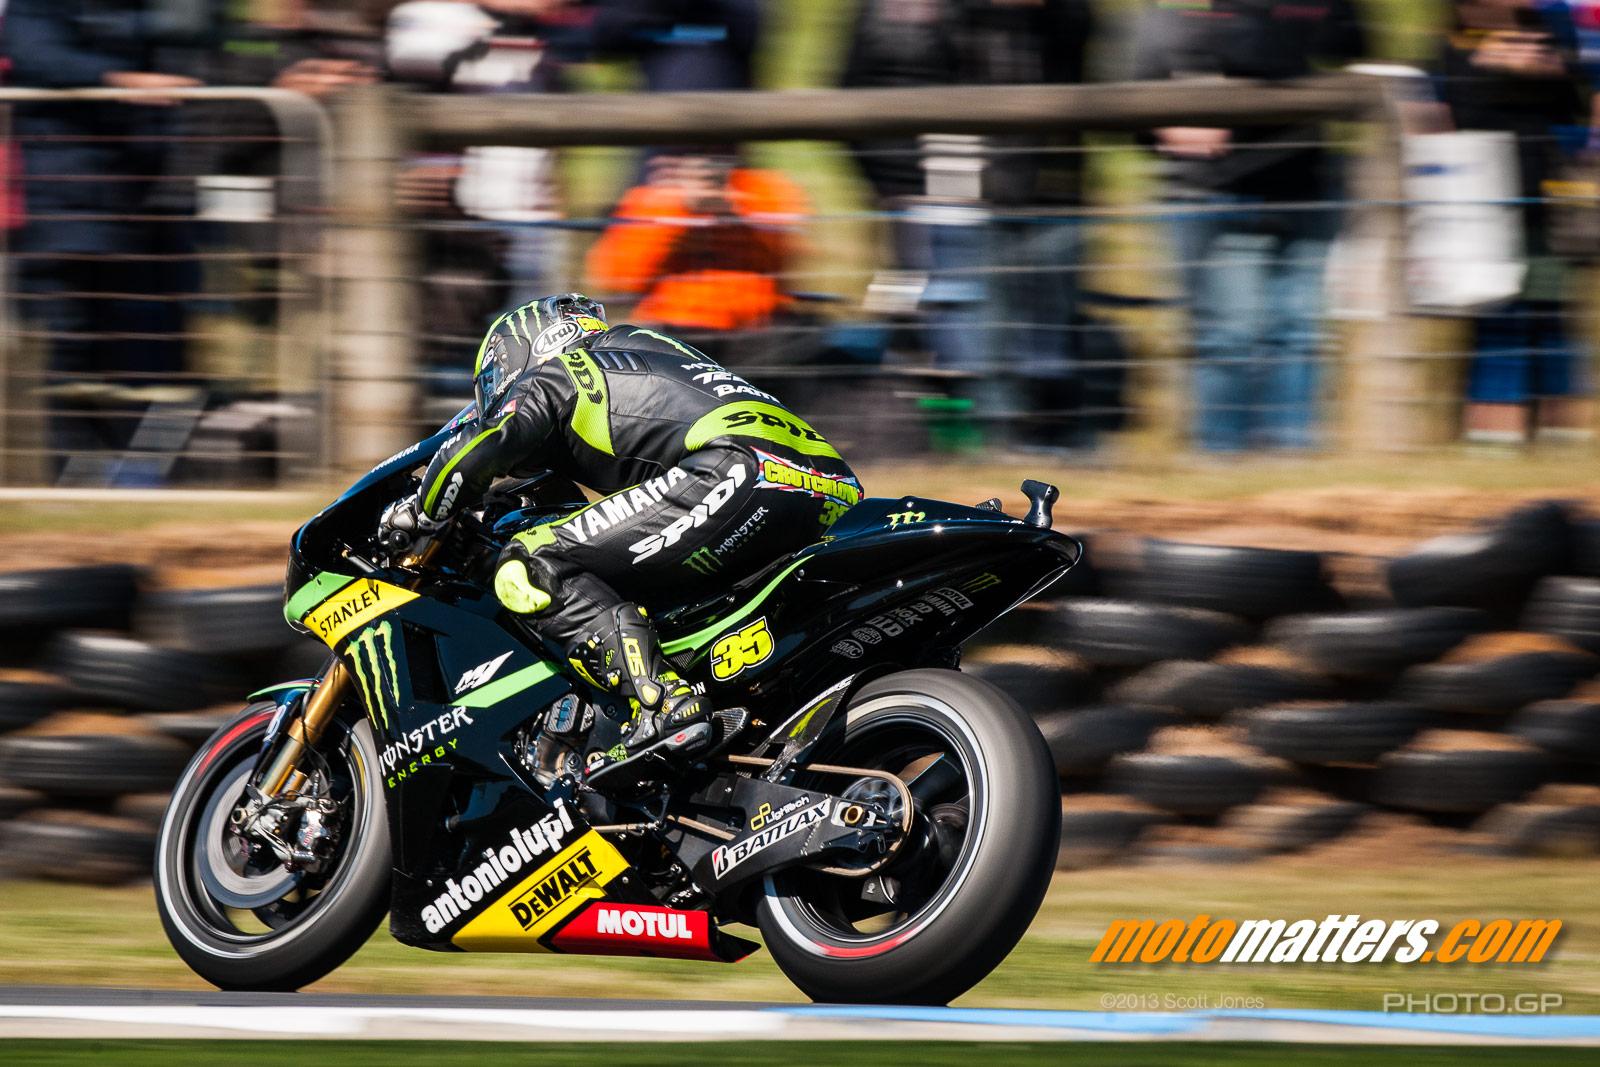 GP Phillip Island - Page 4 2013-MotoGP-16-Phillip-Island-Friday-1282-O